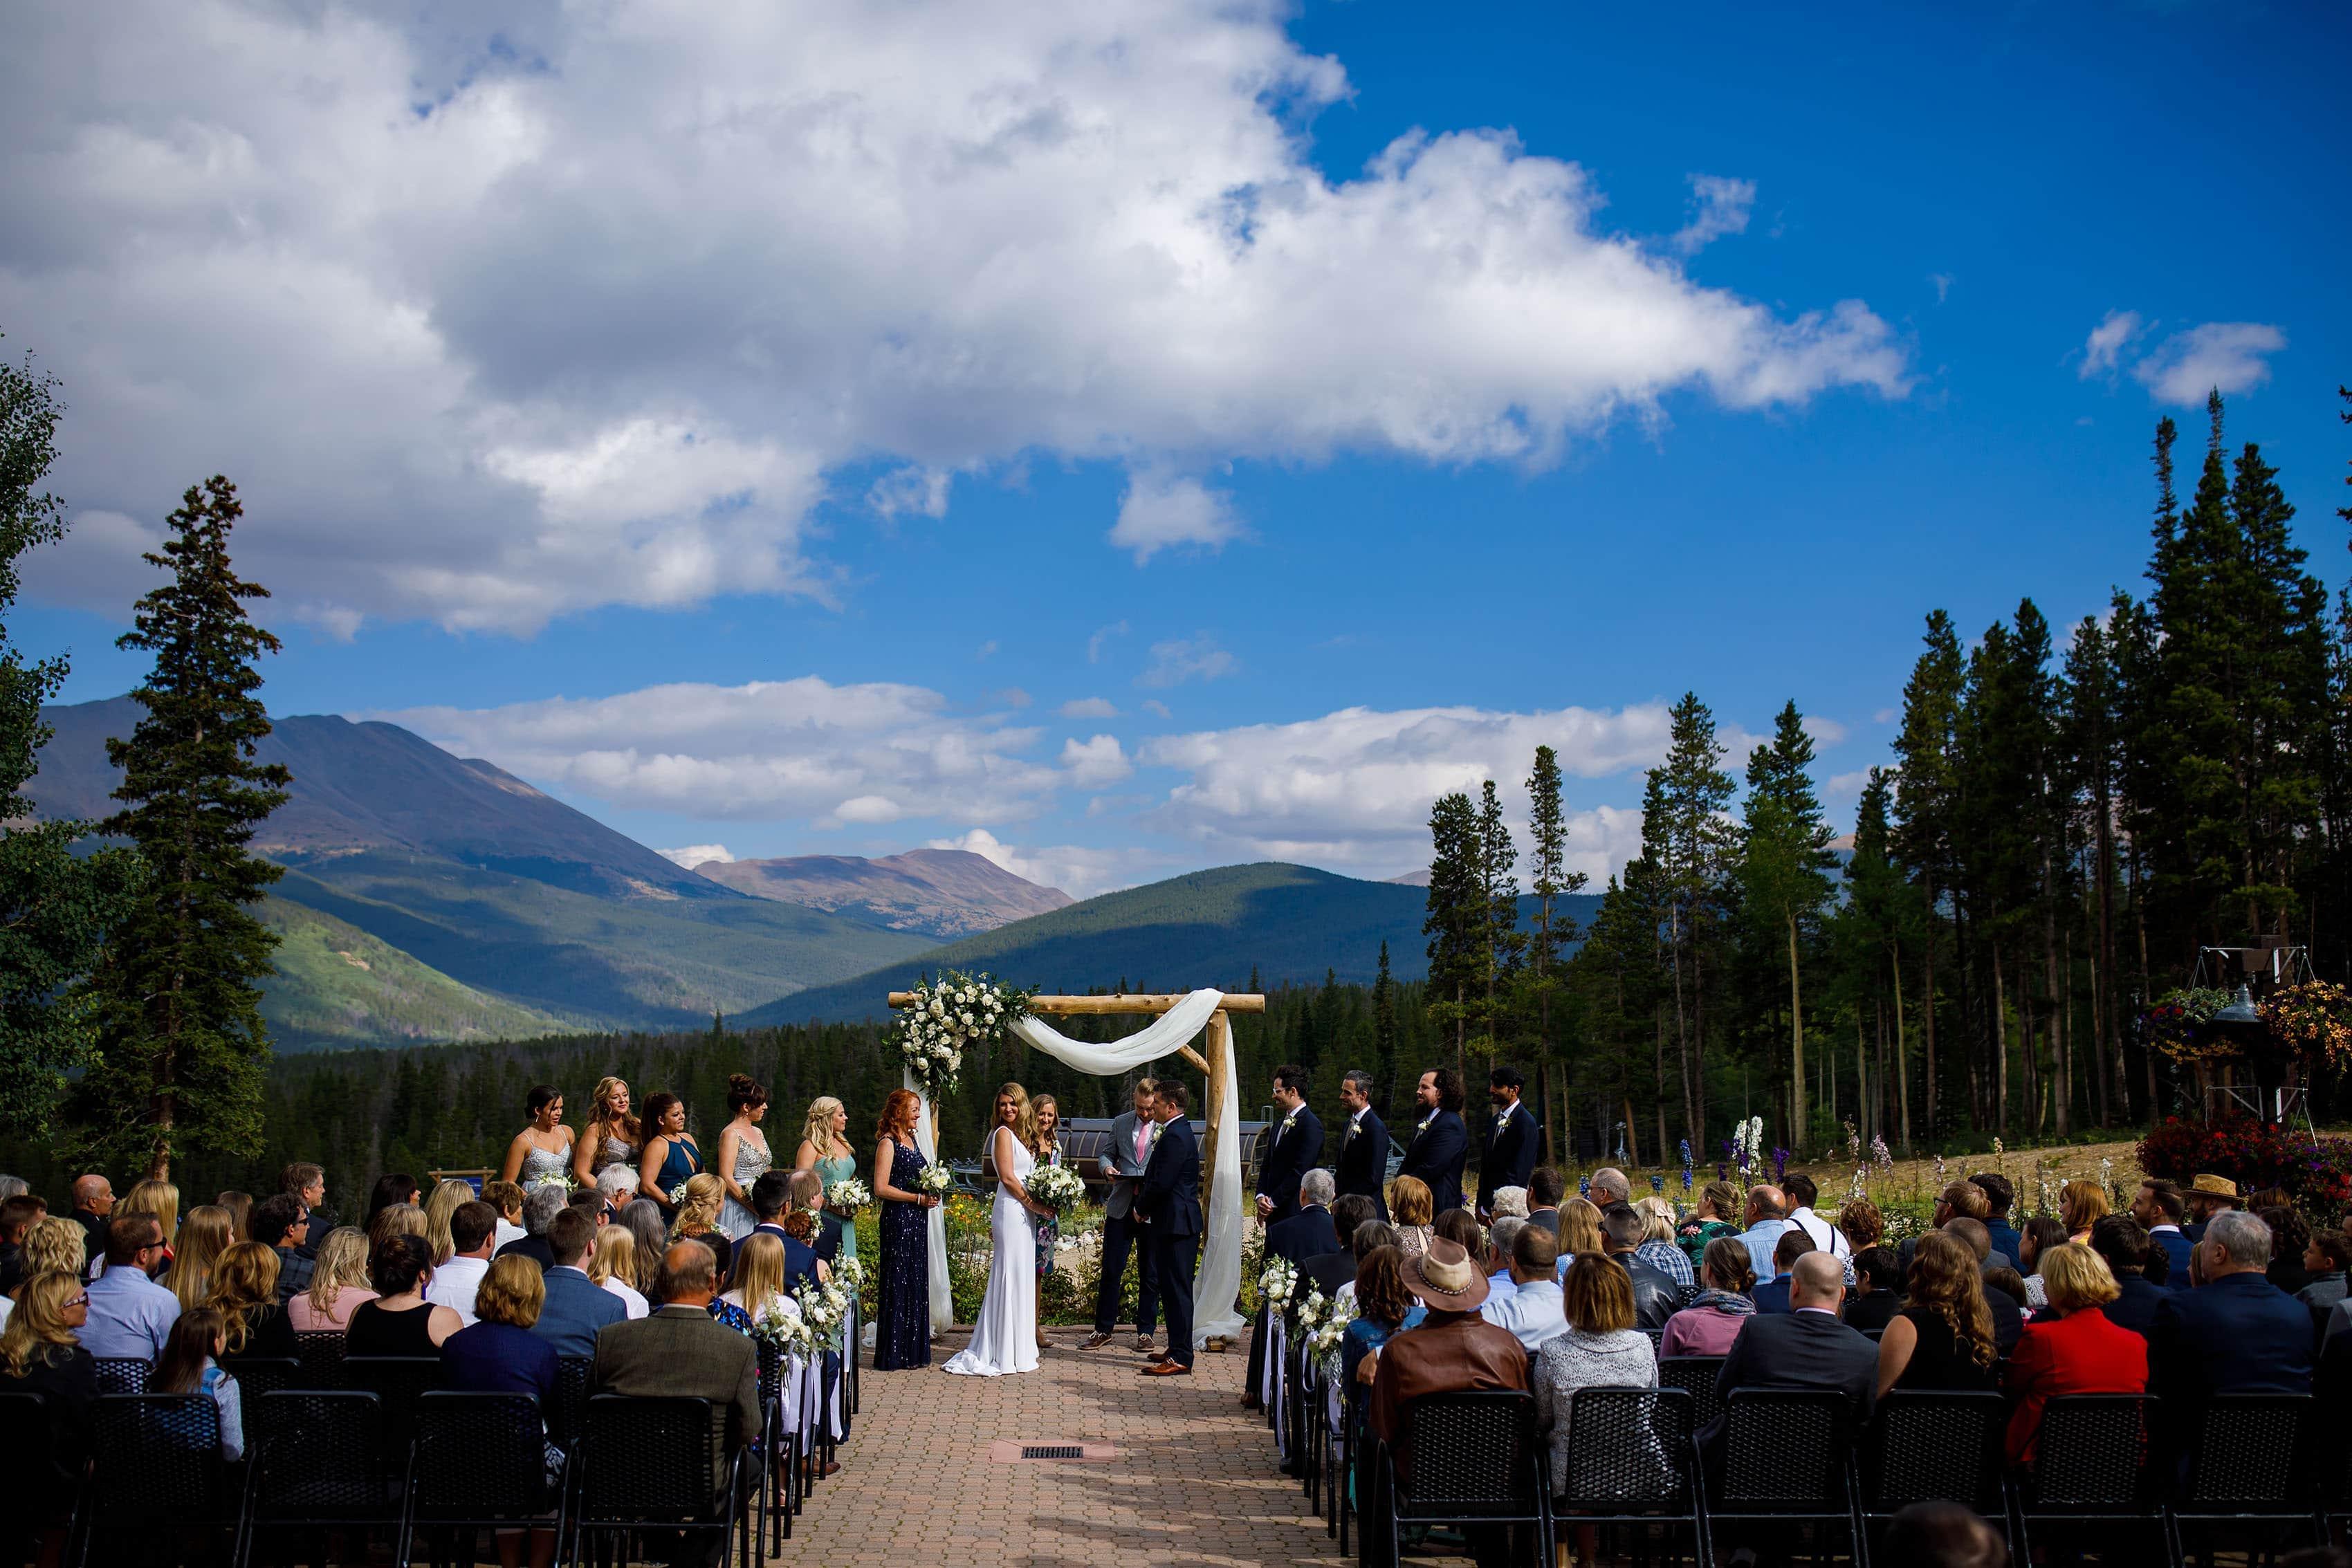 A summer bluebird ceremony at TenMile Station on Peak 9 at Breckenridge resort